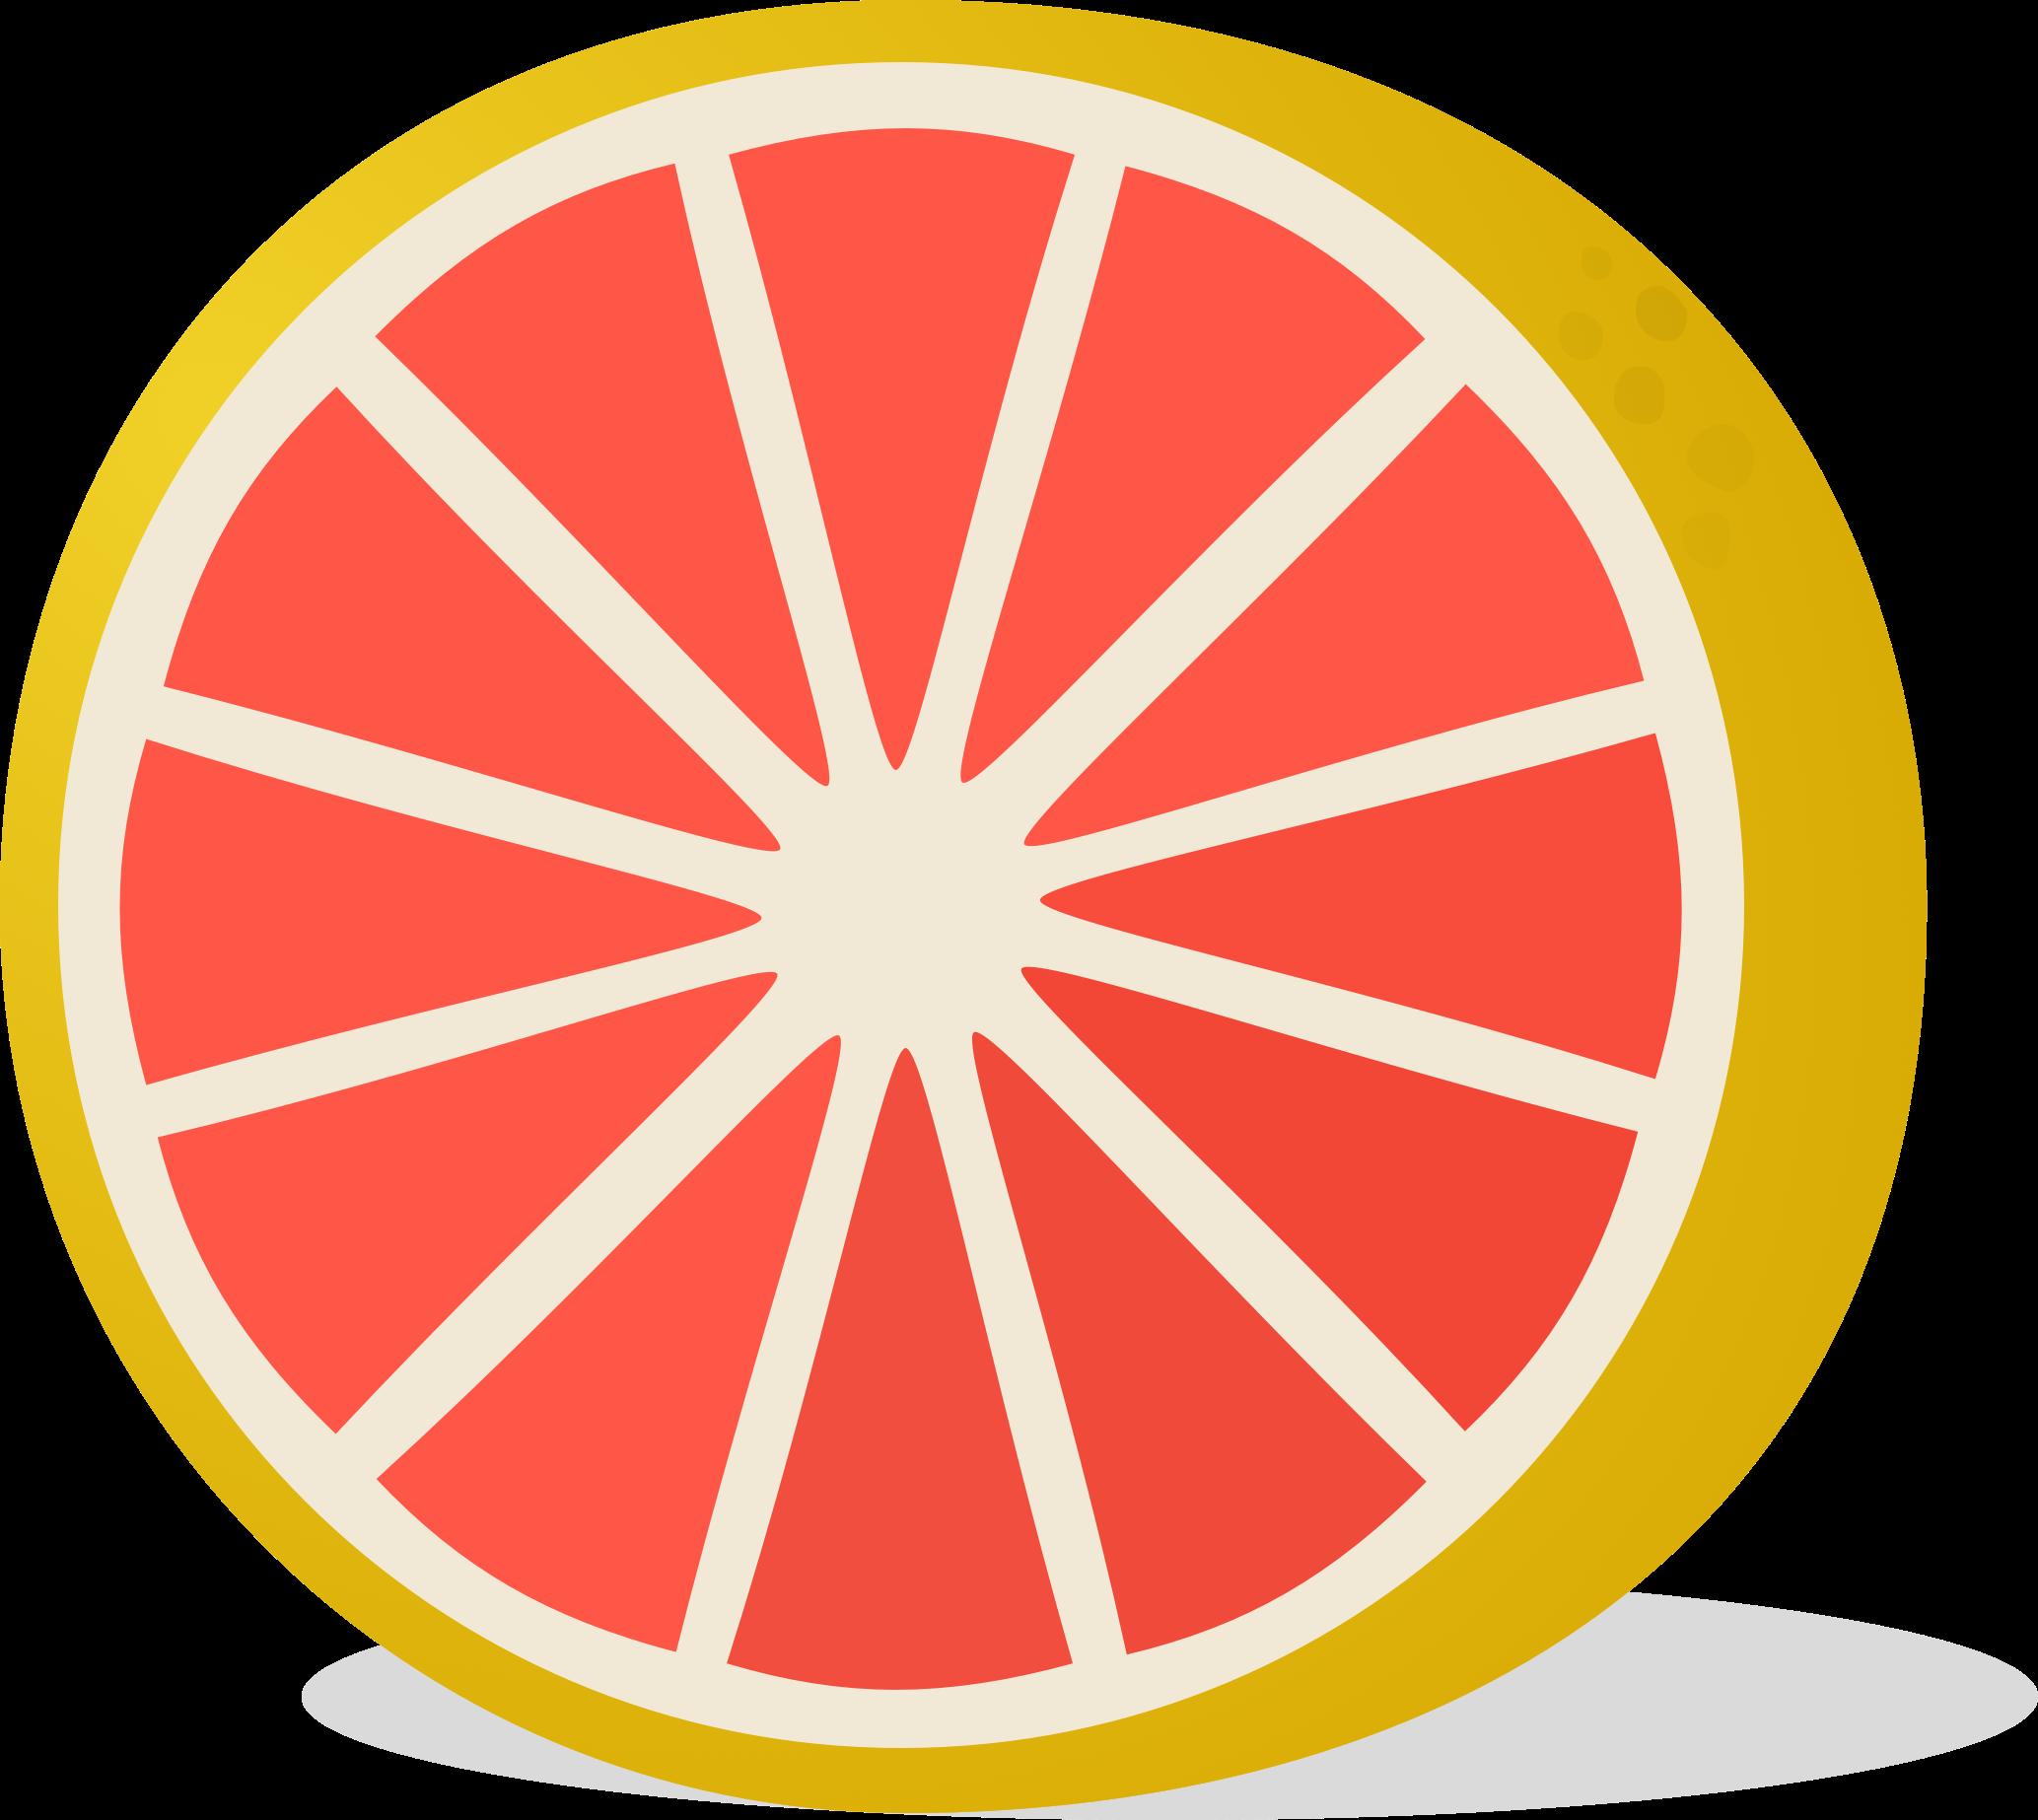 grapefruit mental health app logo